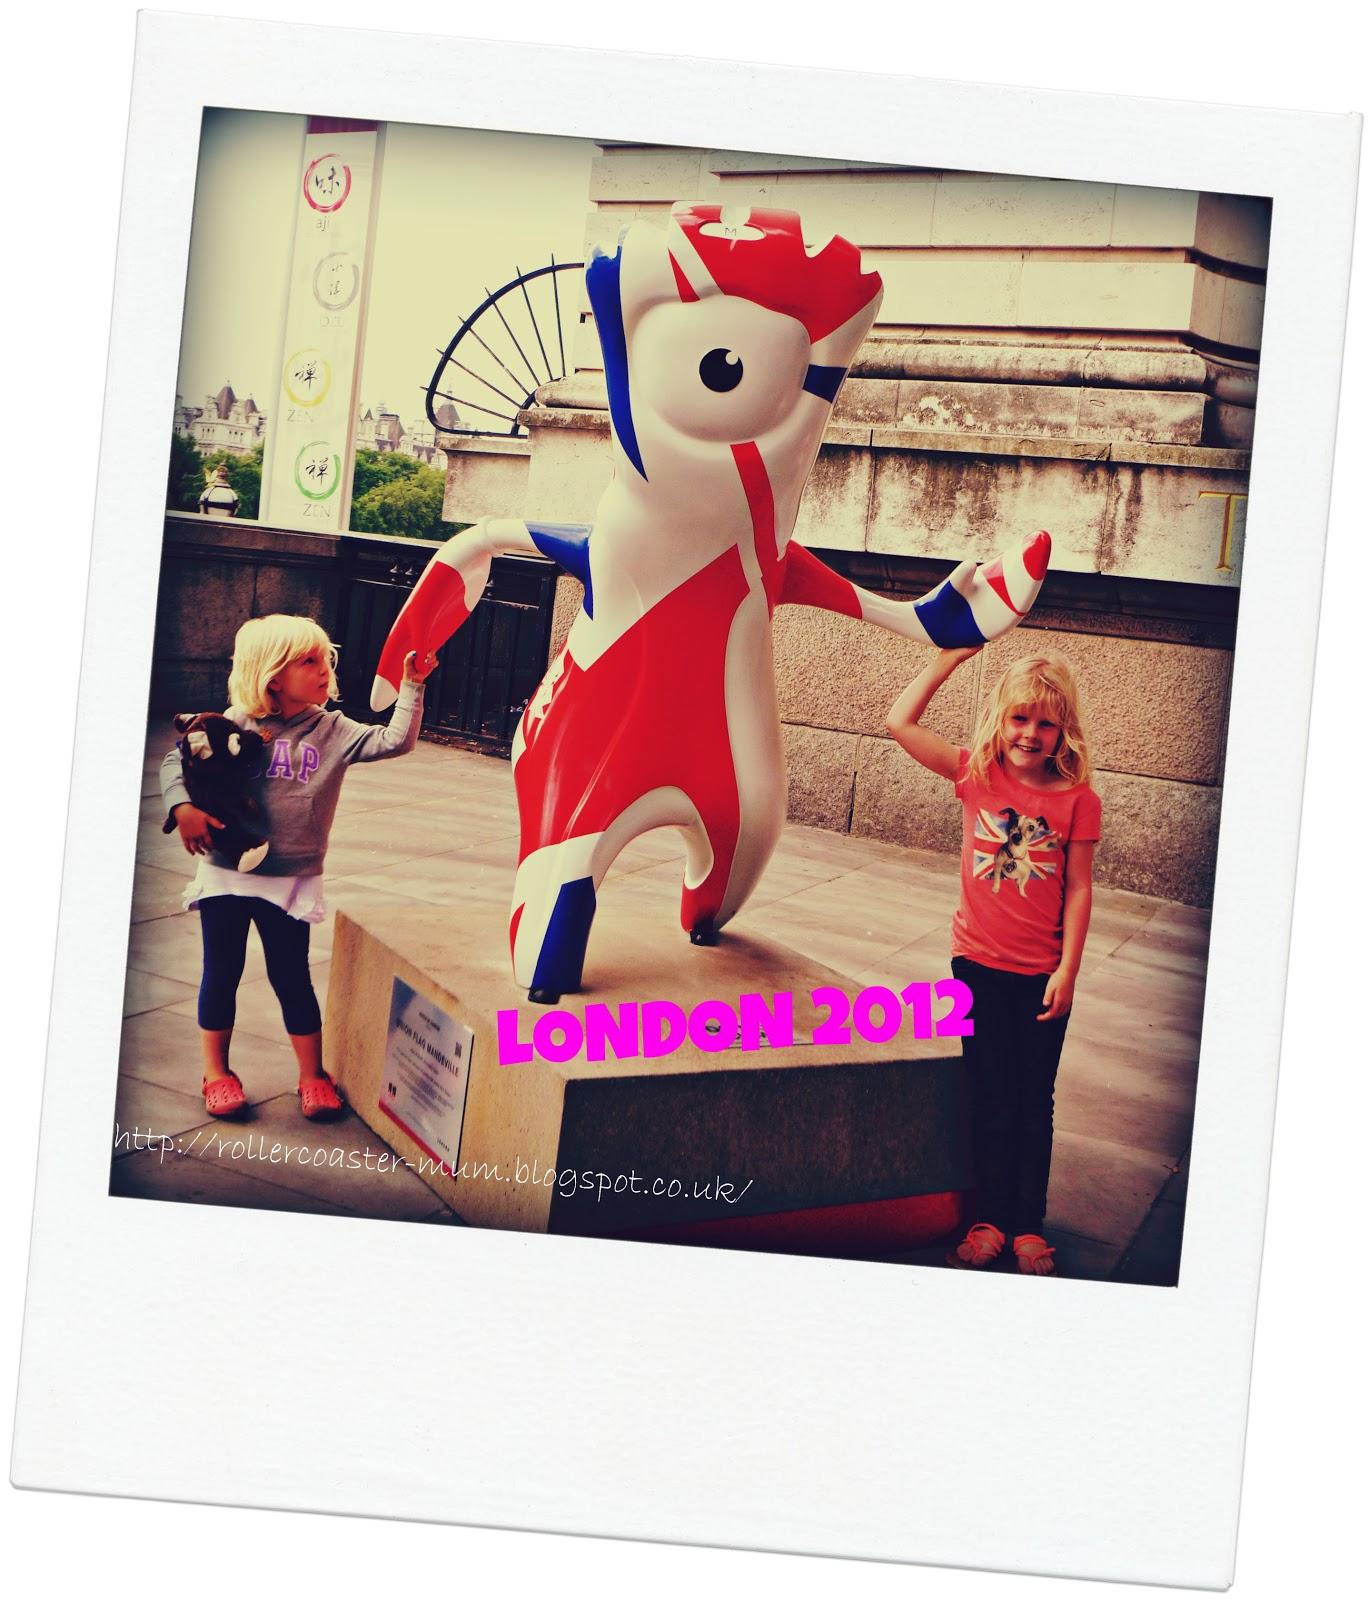 Wenlock, 2012 Olympic mascot